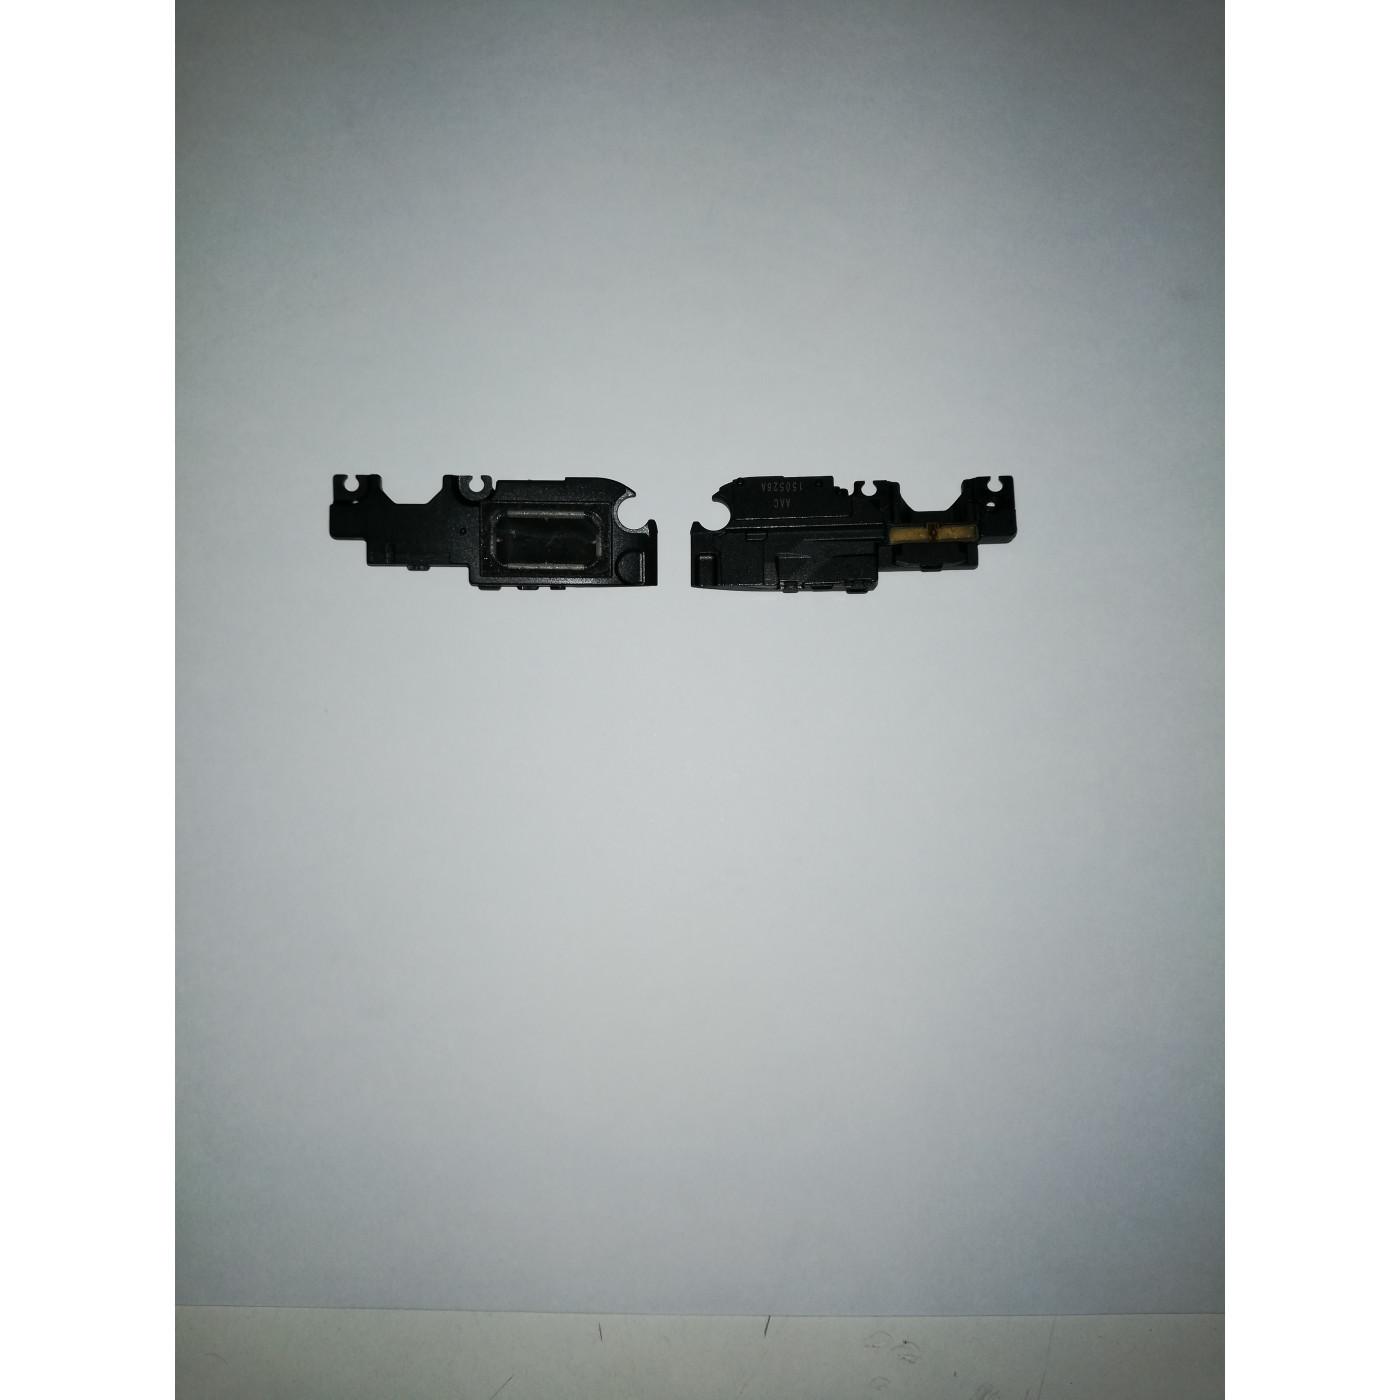 Asus Zenfone 2 Laser / ZE500KL Buzzer Ruftonlautsprecher